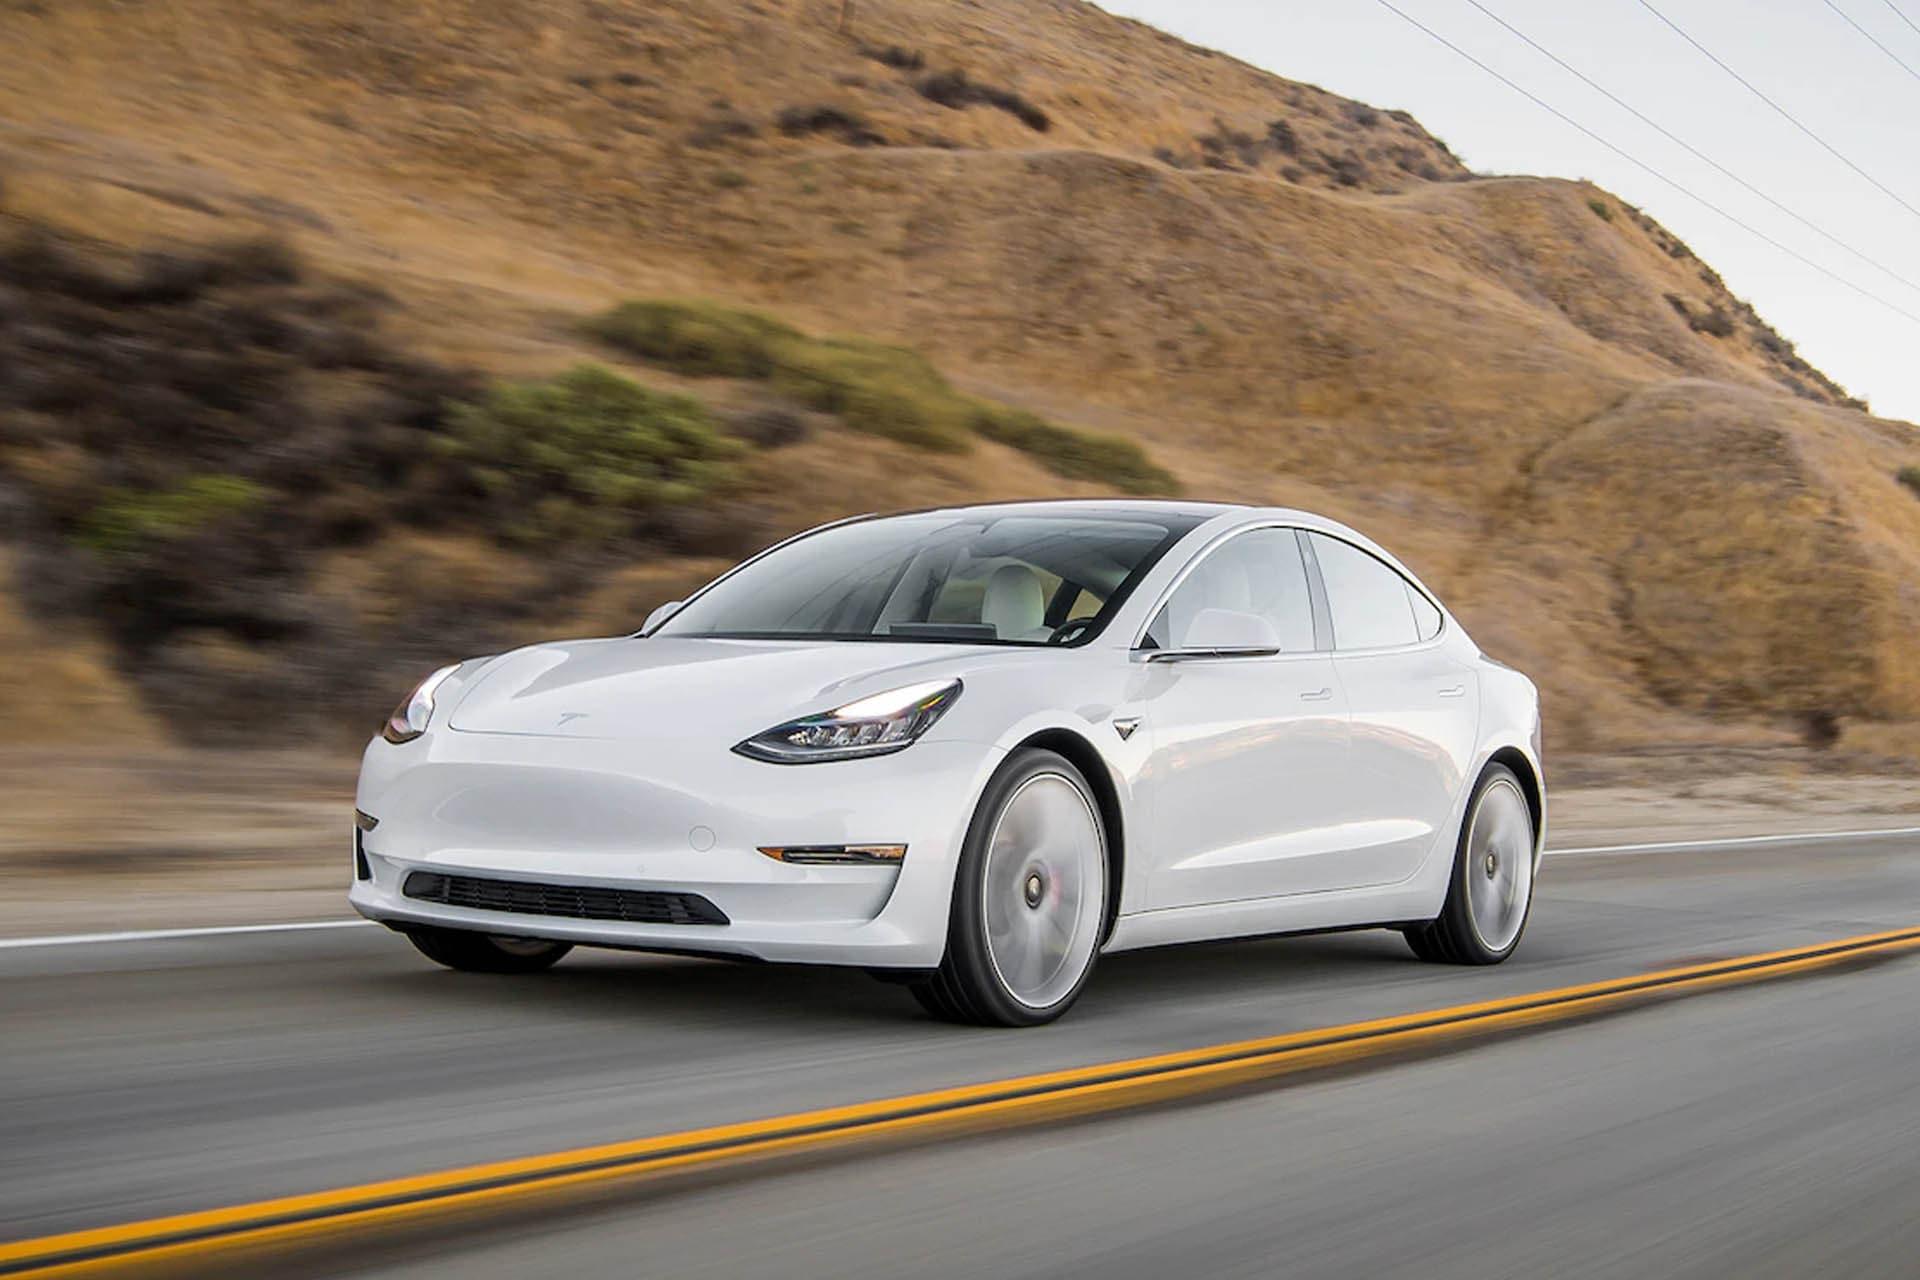 Me Tinder Tesla Cums Termine เซ็กซ์คลิป ในรถ